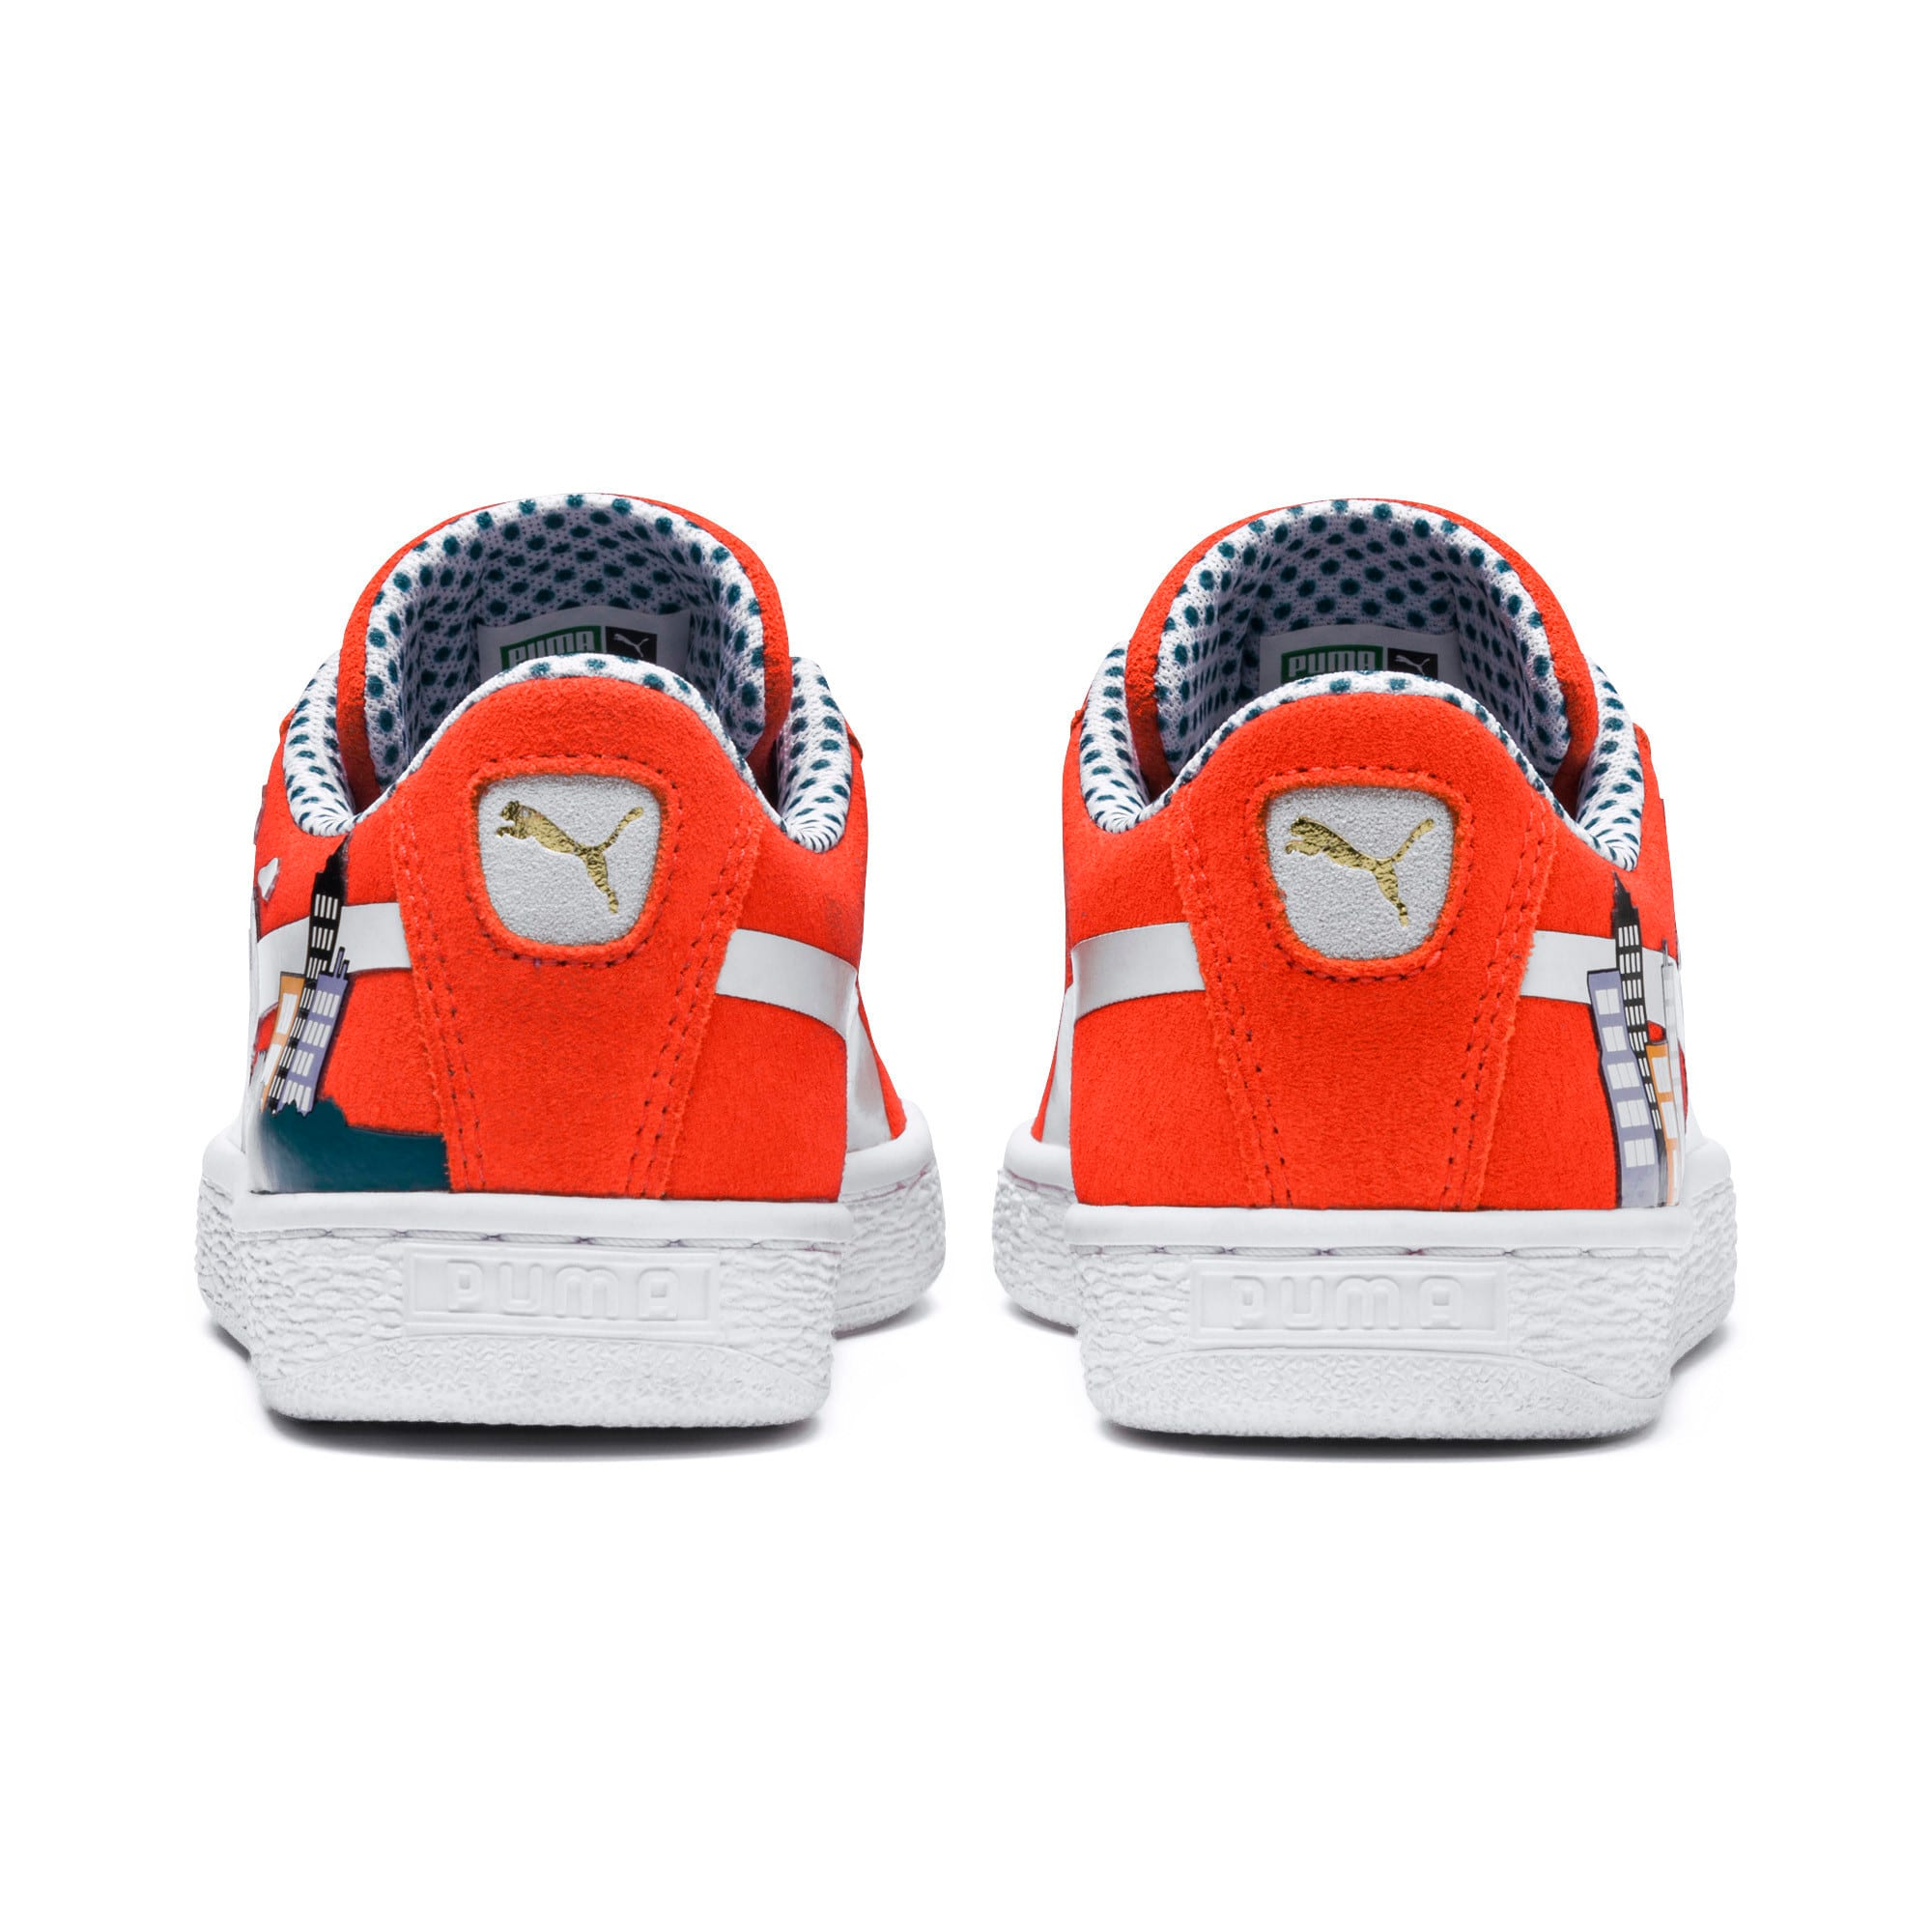 Thumbnail 3 of Sesame Street 50 Suede Little Kids' Shoes, Cherry Tomato-Puma White, medium